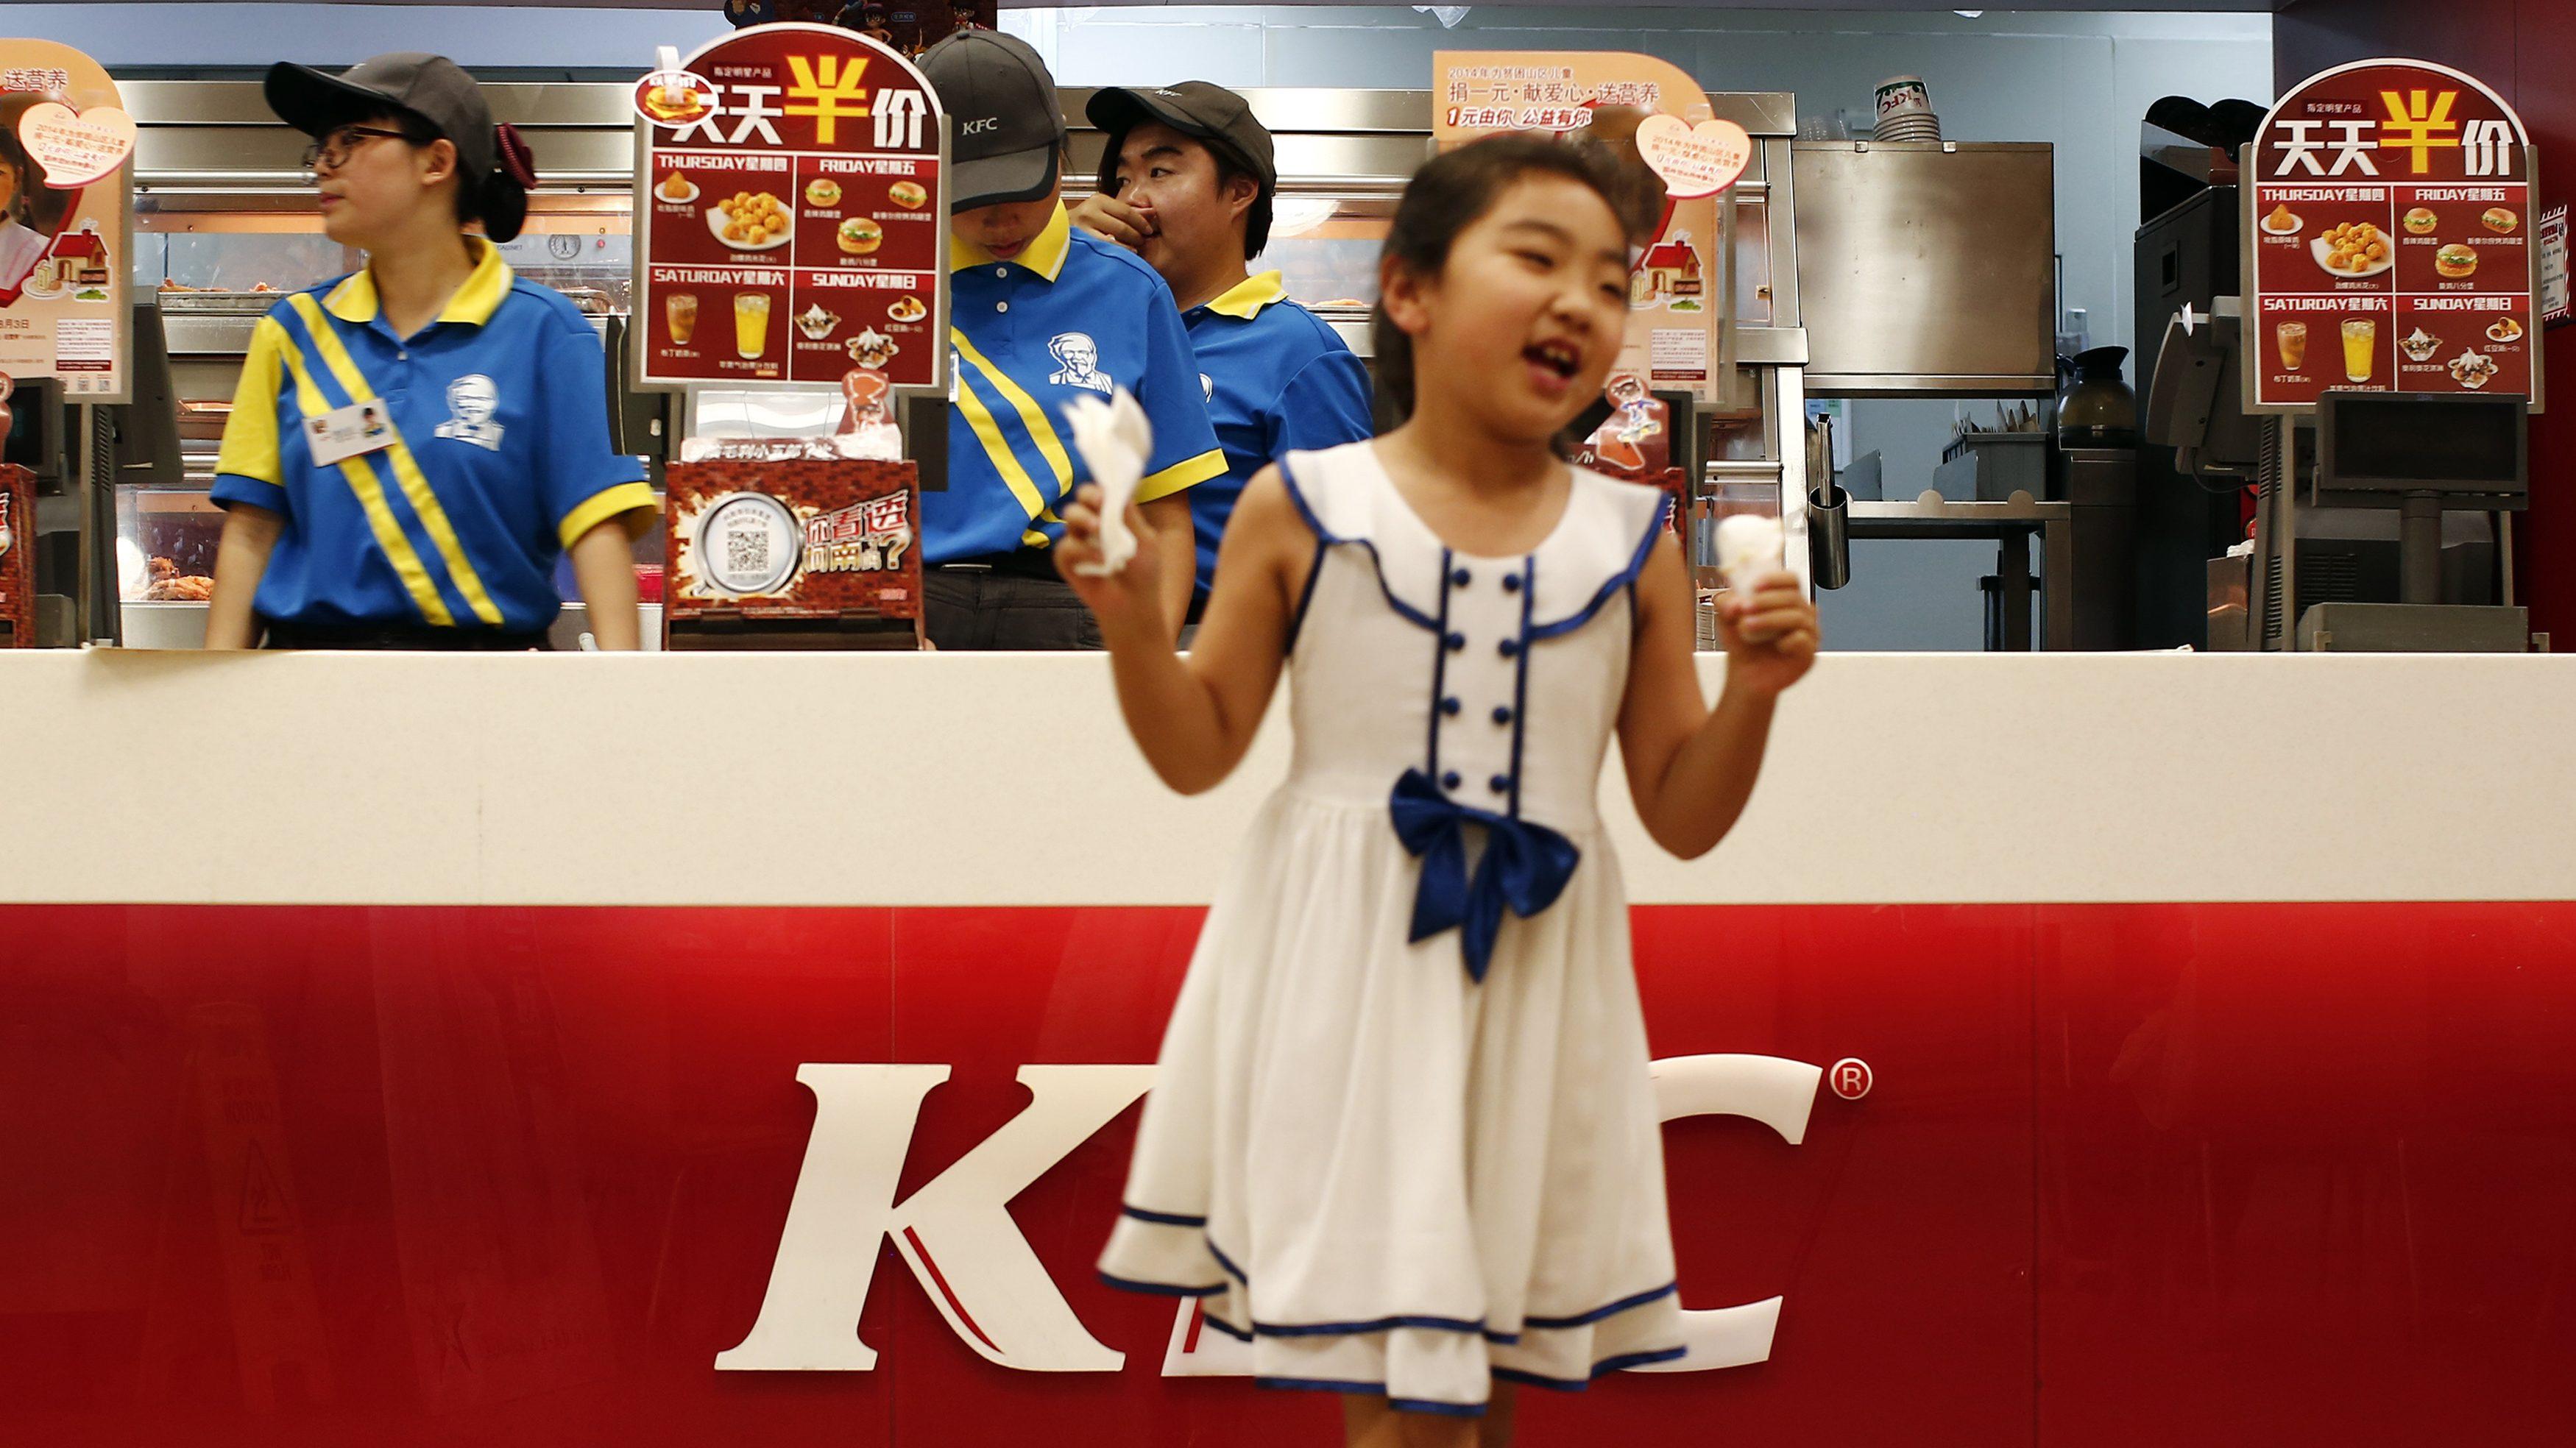 A KFC restaurant in China